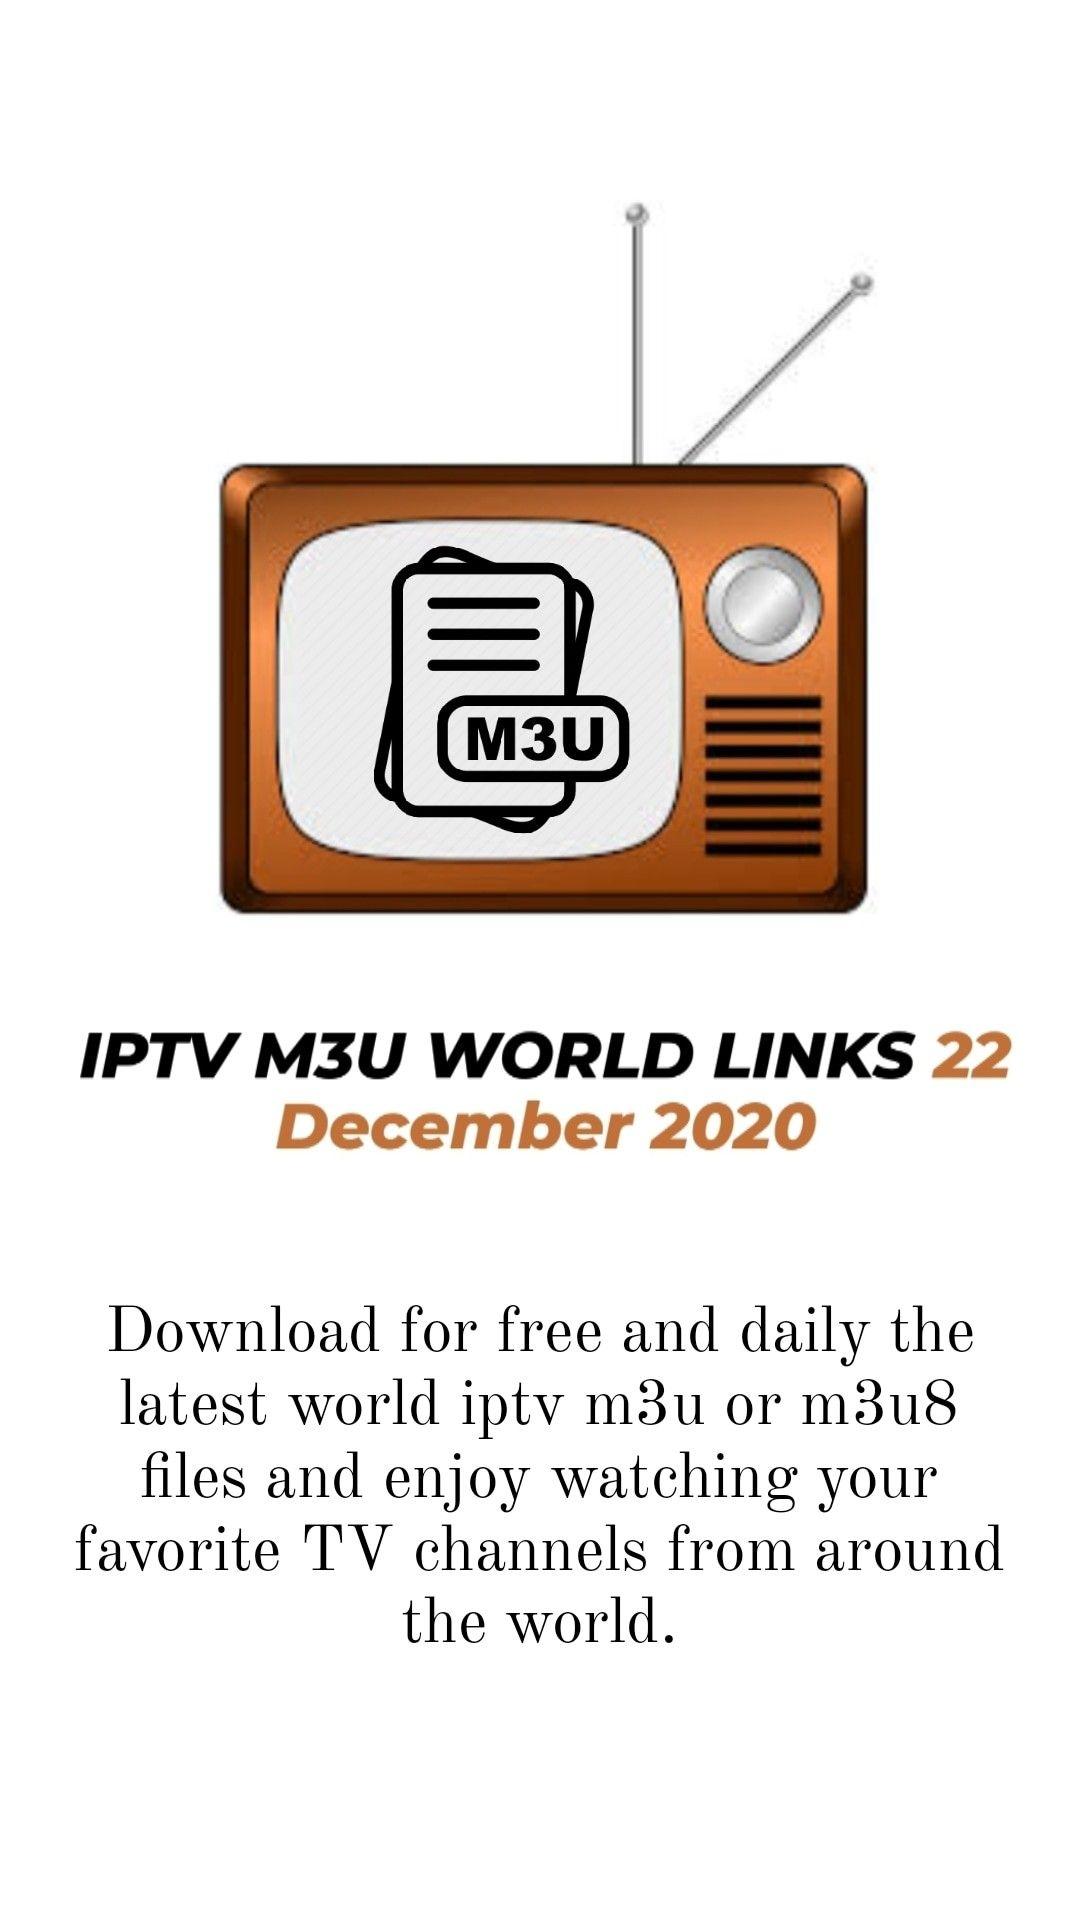 Iptv M3u World Links 22 December 2020 Tv Channels Mtv Live Discovery Channel